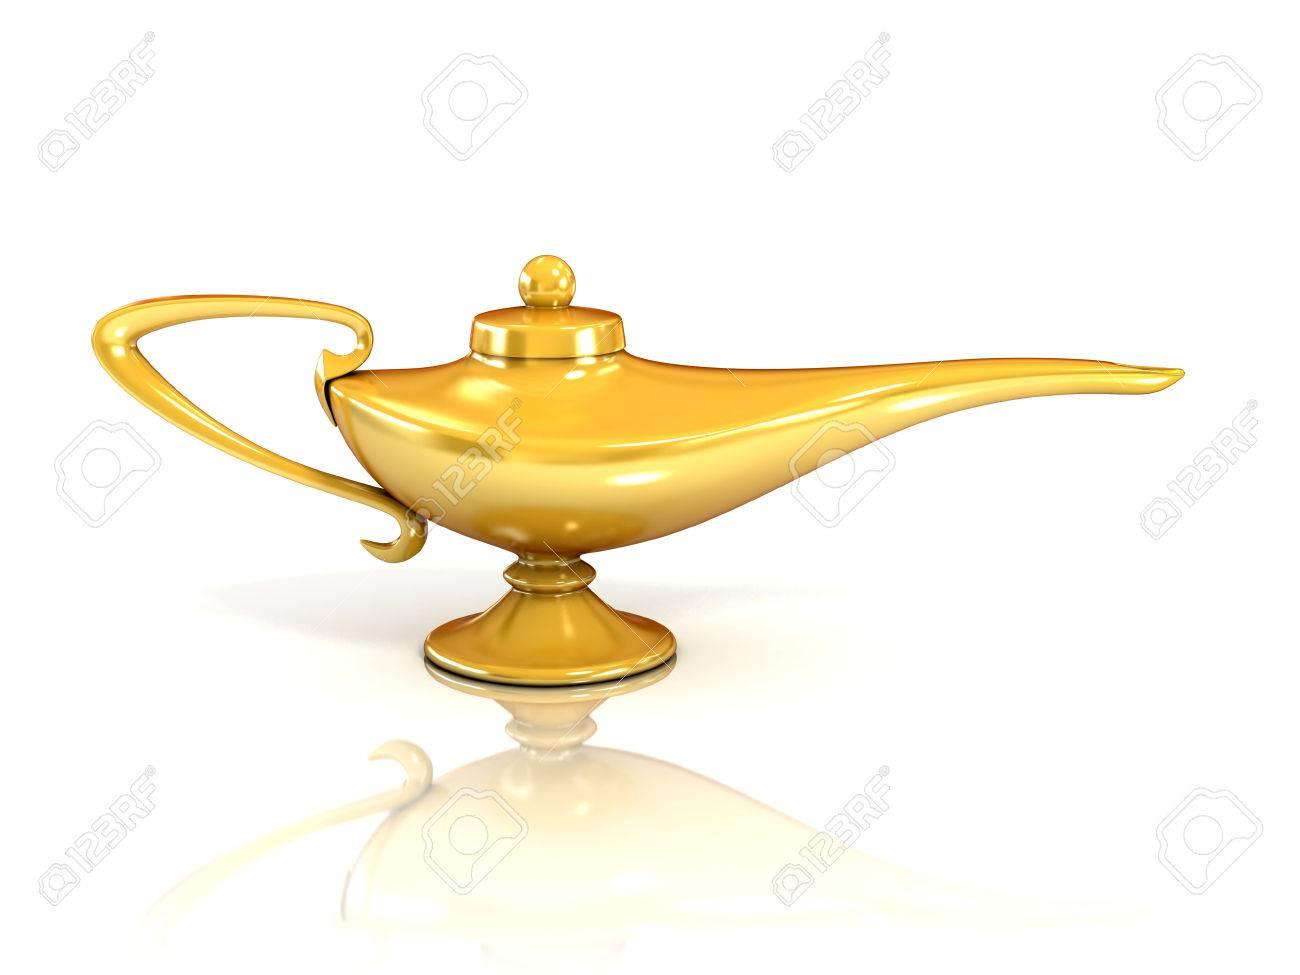 Aladdin Magic Lamp 3d Illustration Stock Illustration   37125690